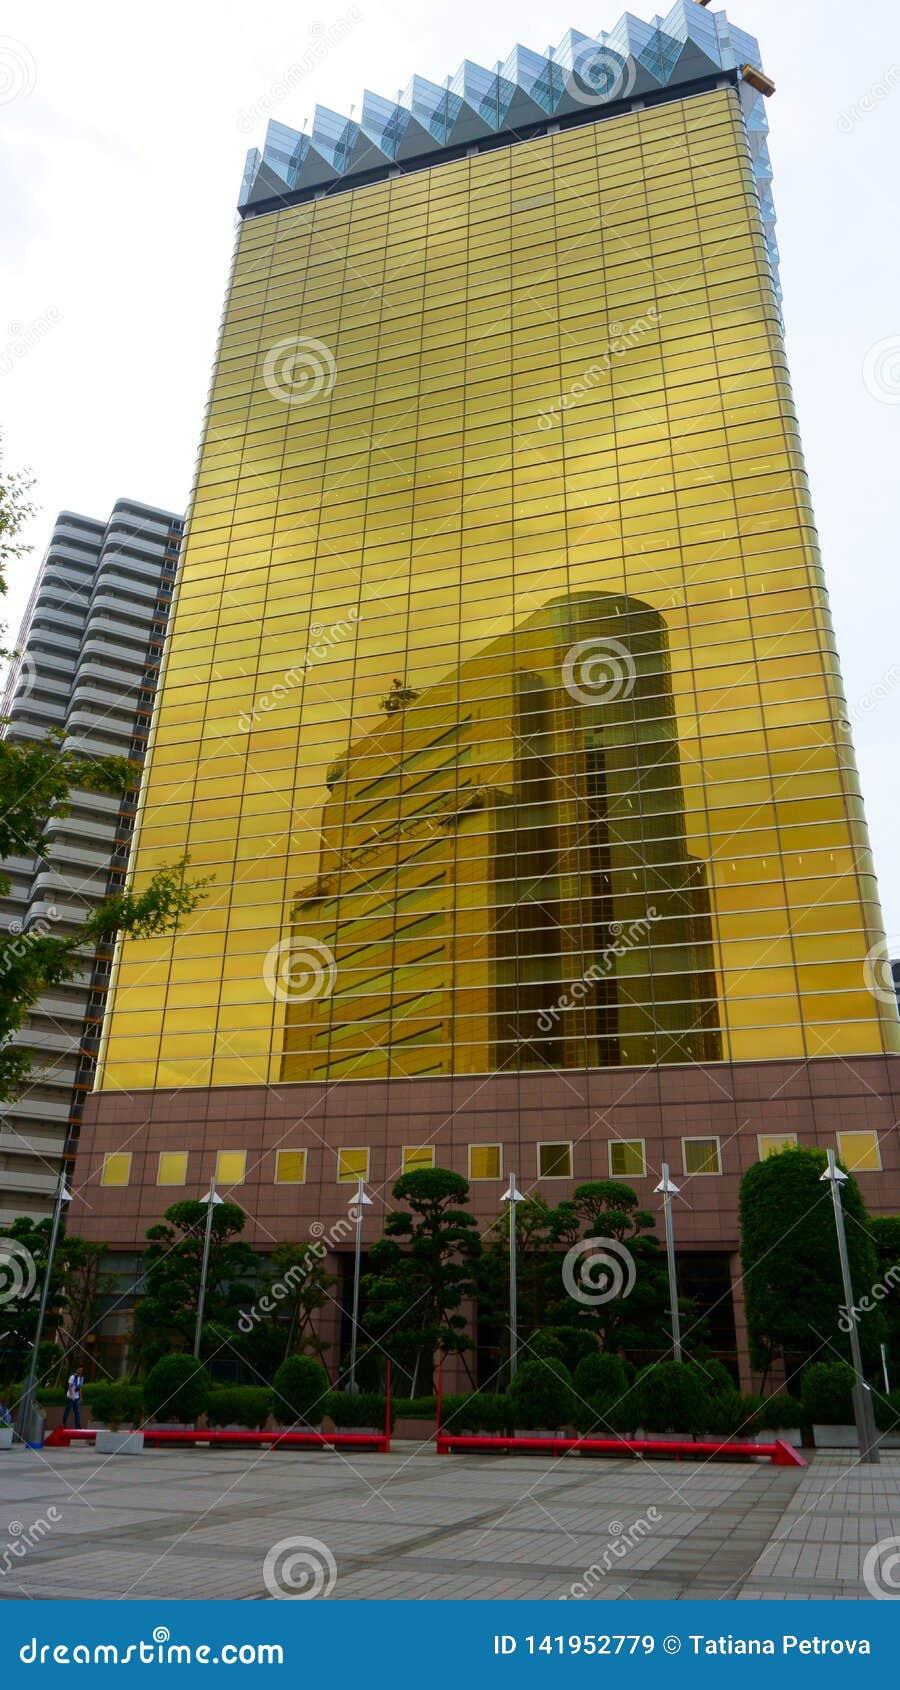 Asahi Beer Headquarters Edificio per uffici moderno